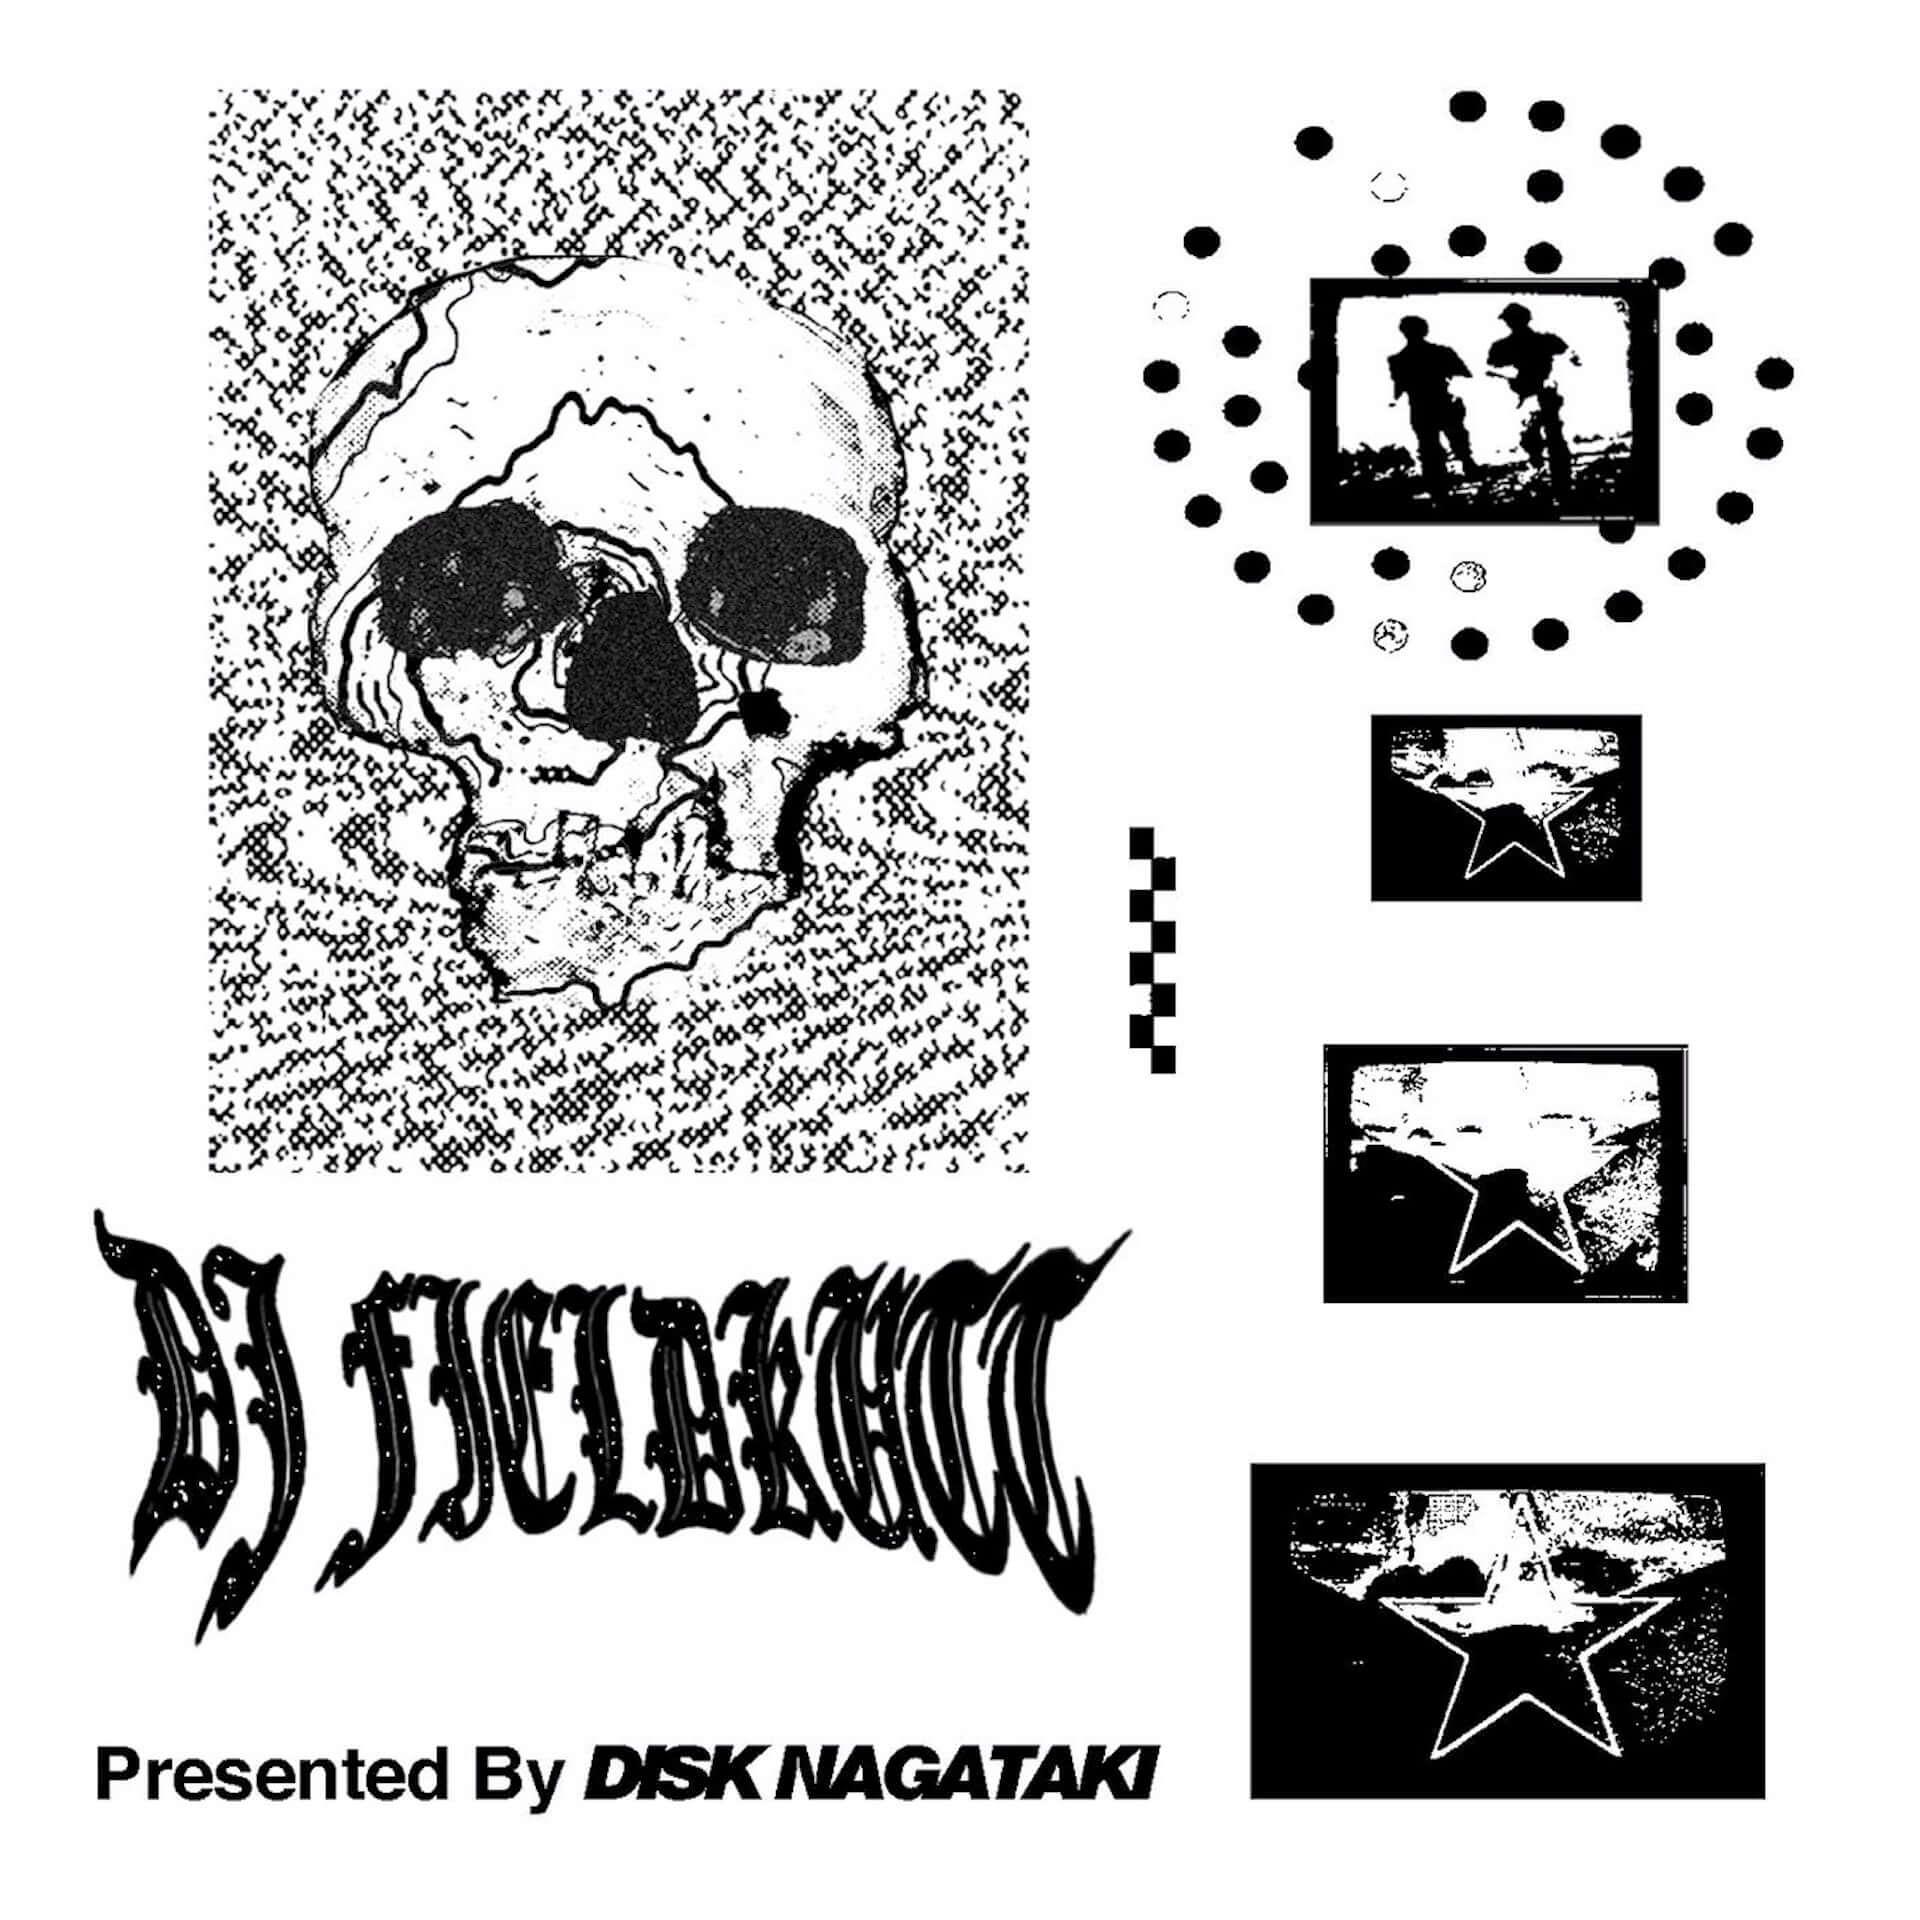 tokyovitaminのDISK NAGATAKIが初のオリジナルEPを発表| 『retzev』『FIELDKUTTER』2枚同時リリース! music190917-disknagataki-1-1920x1920